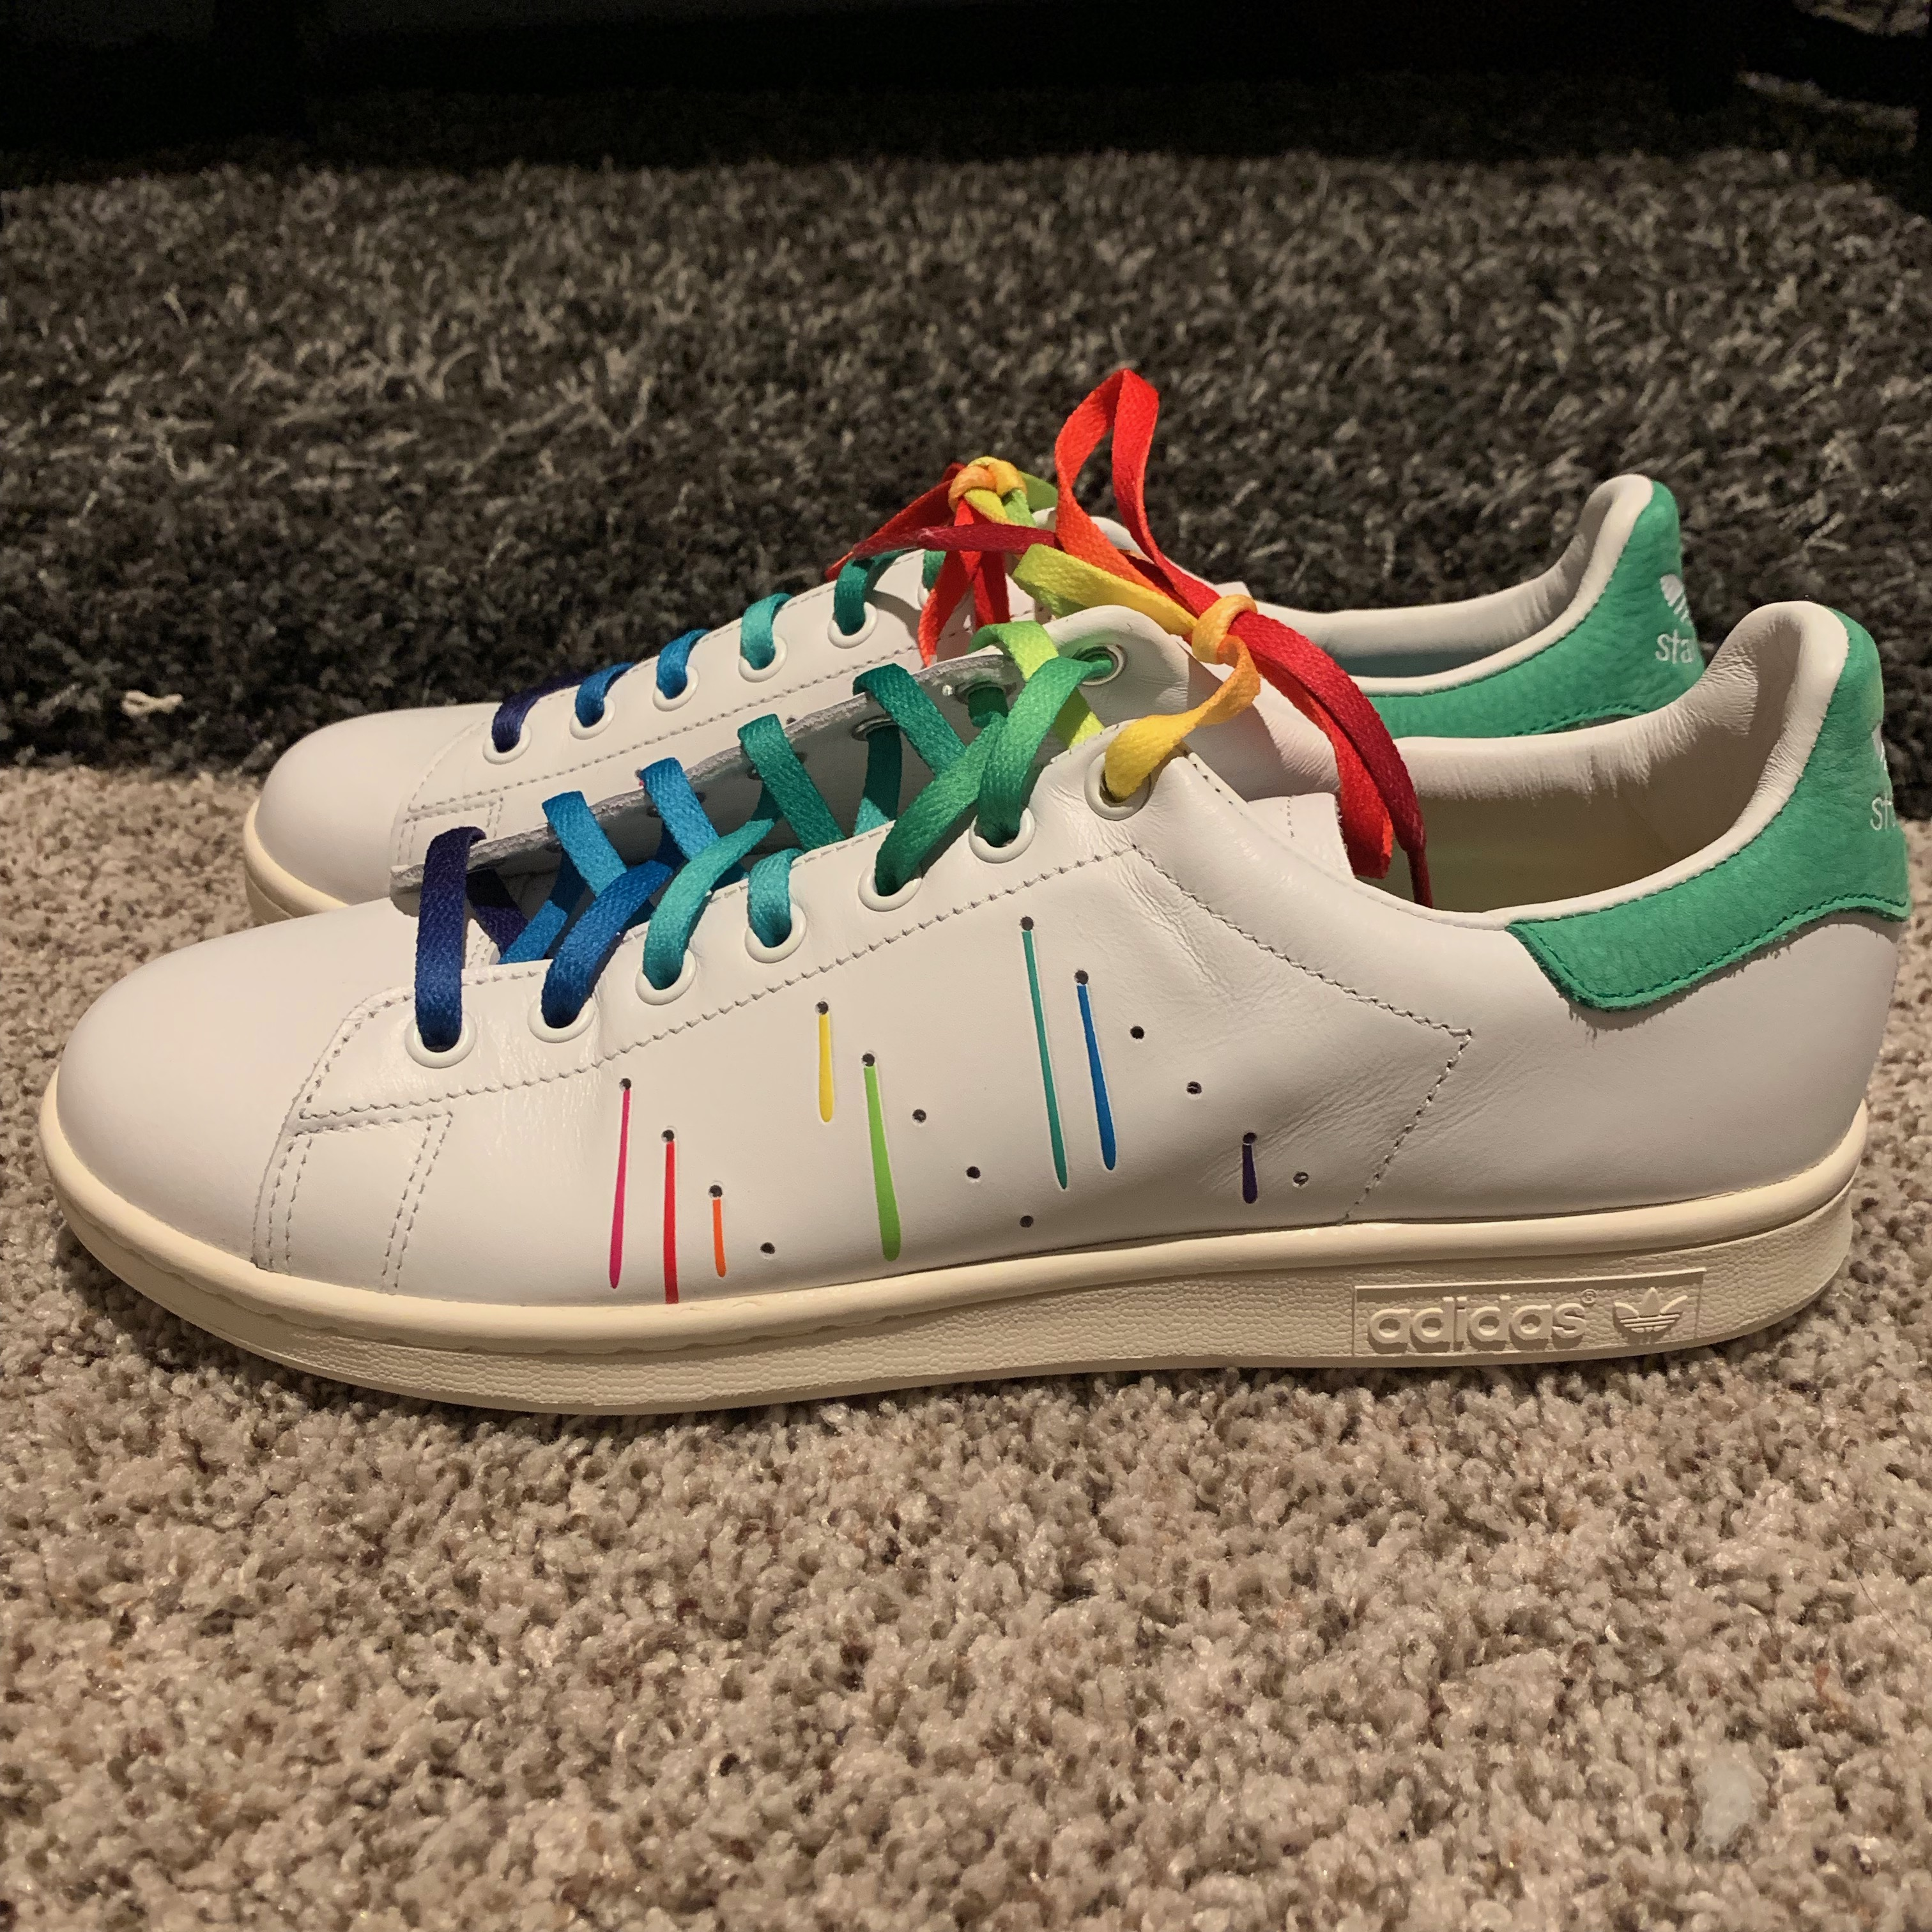 9065a61d724f Adidas Adidas Stan Smith Gay Pride Shoes White Rainbow